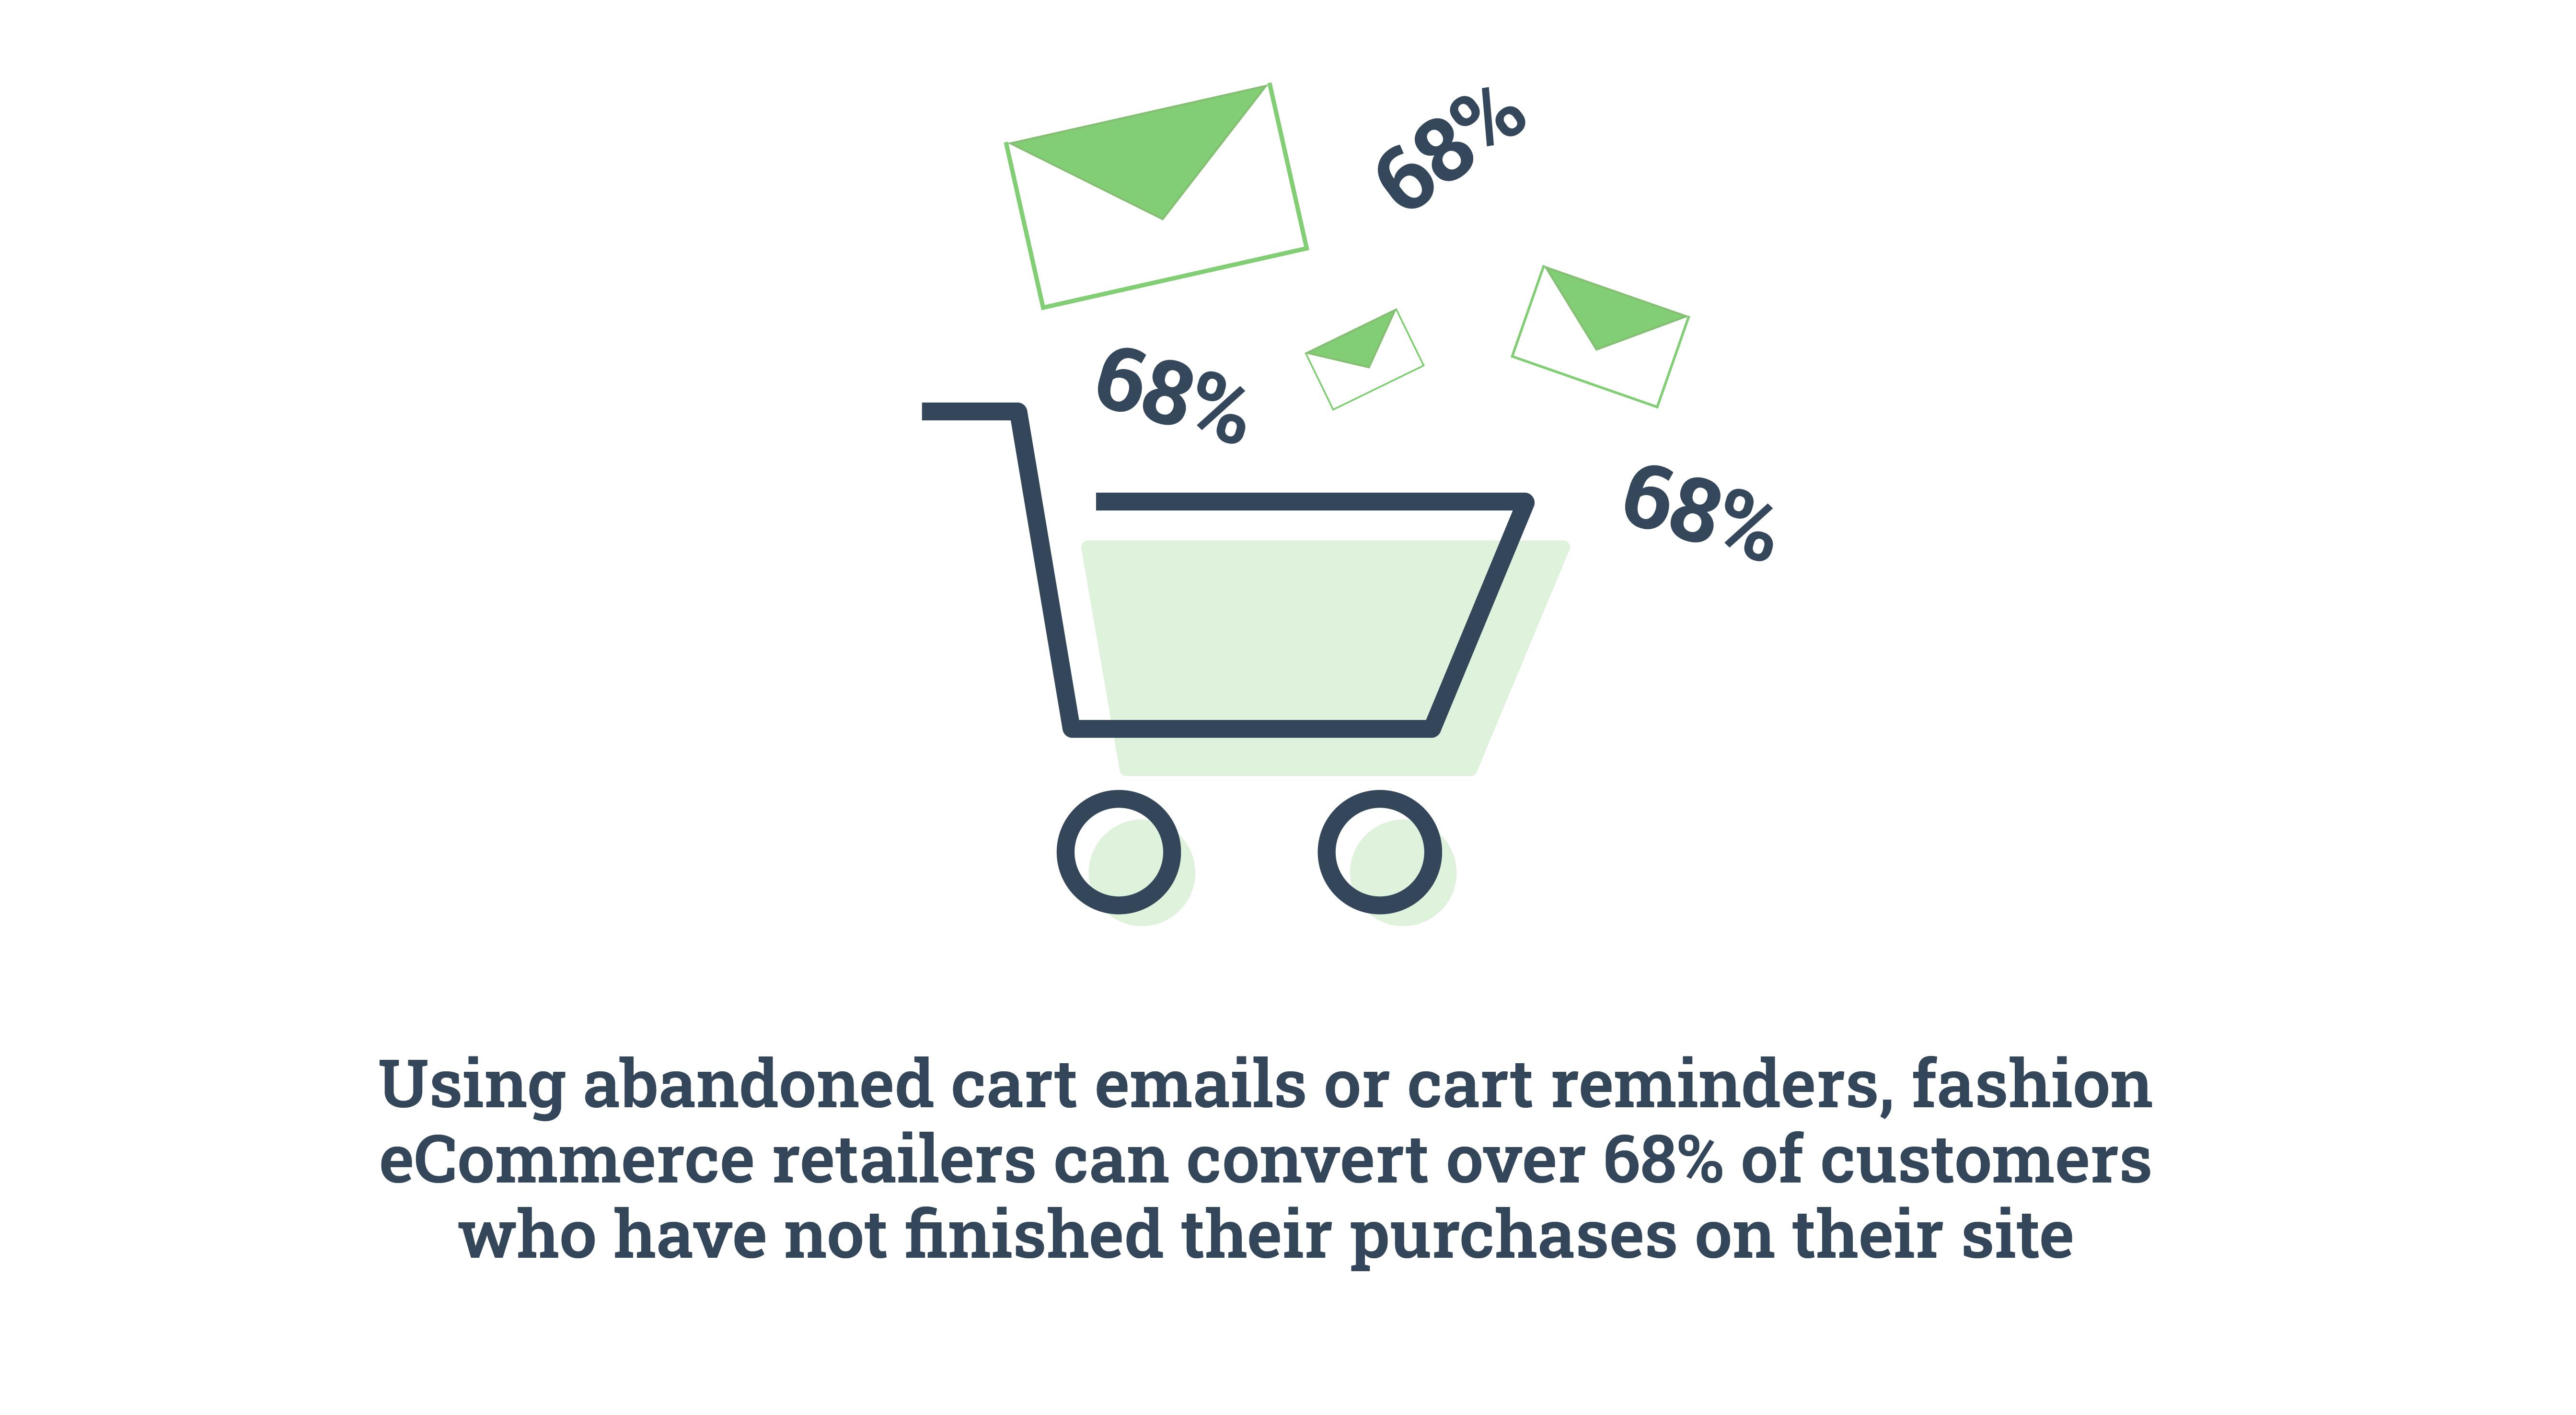 Abandoned cart statistic